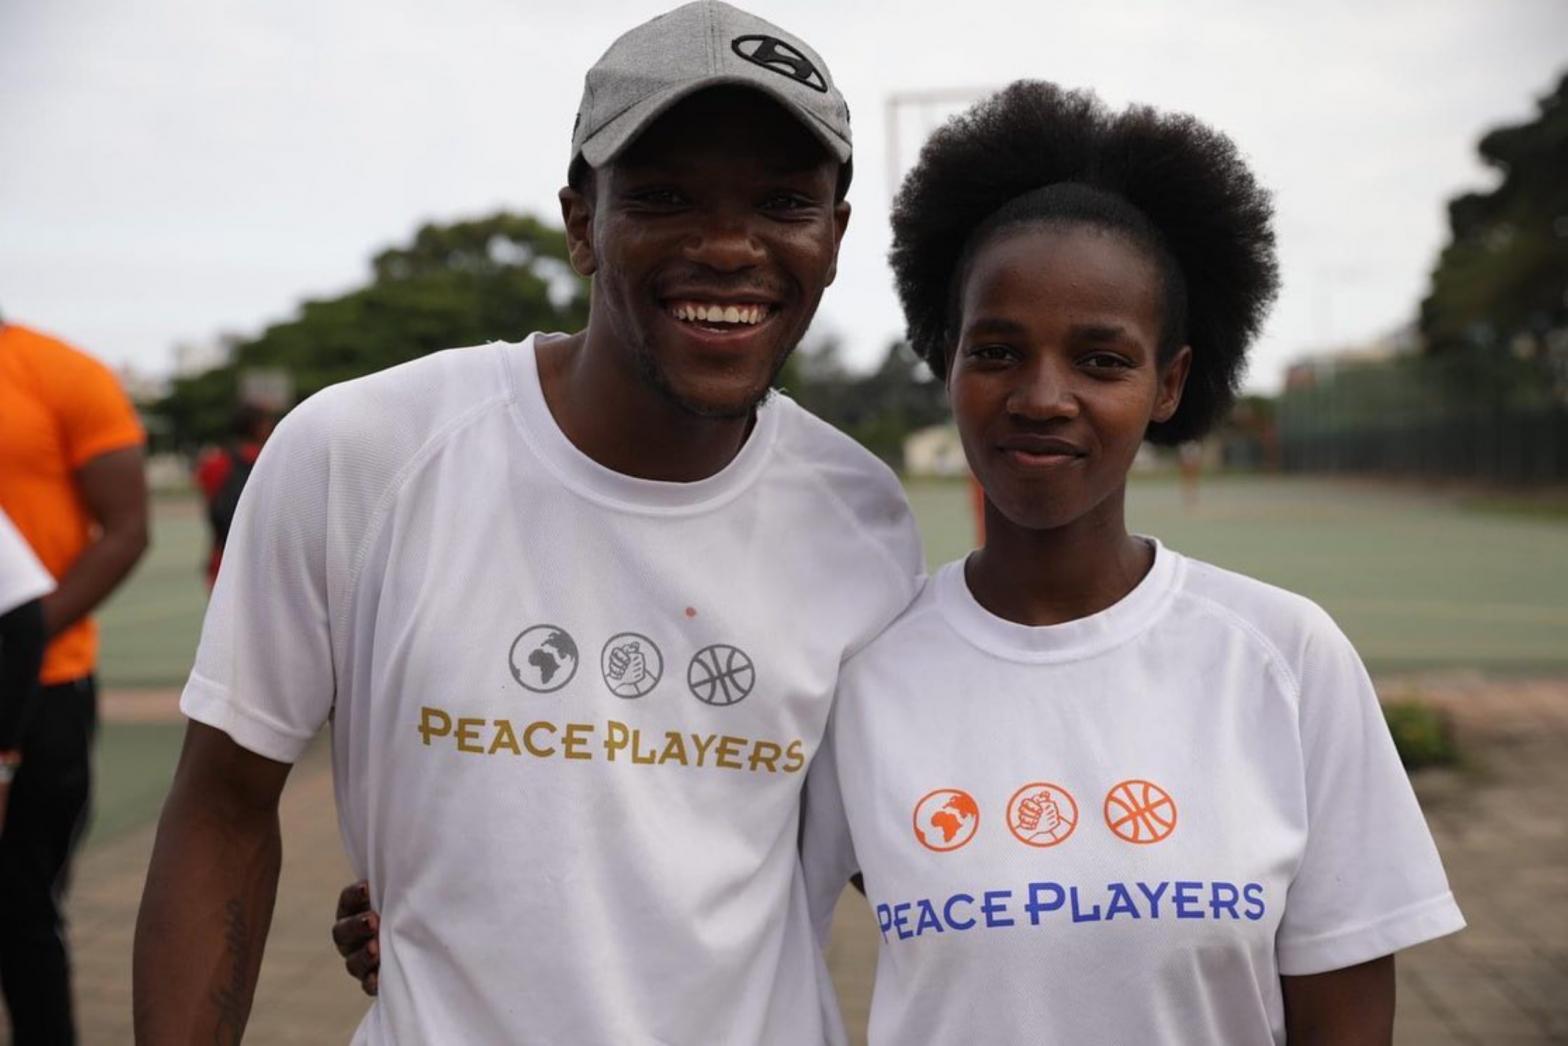 Thandeka PeacePlayers South Africa 1